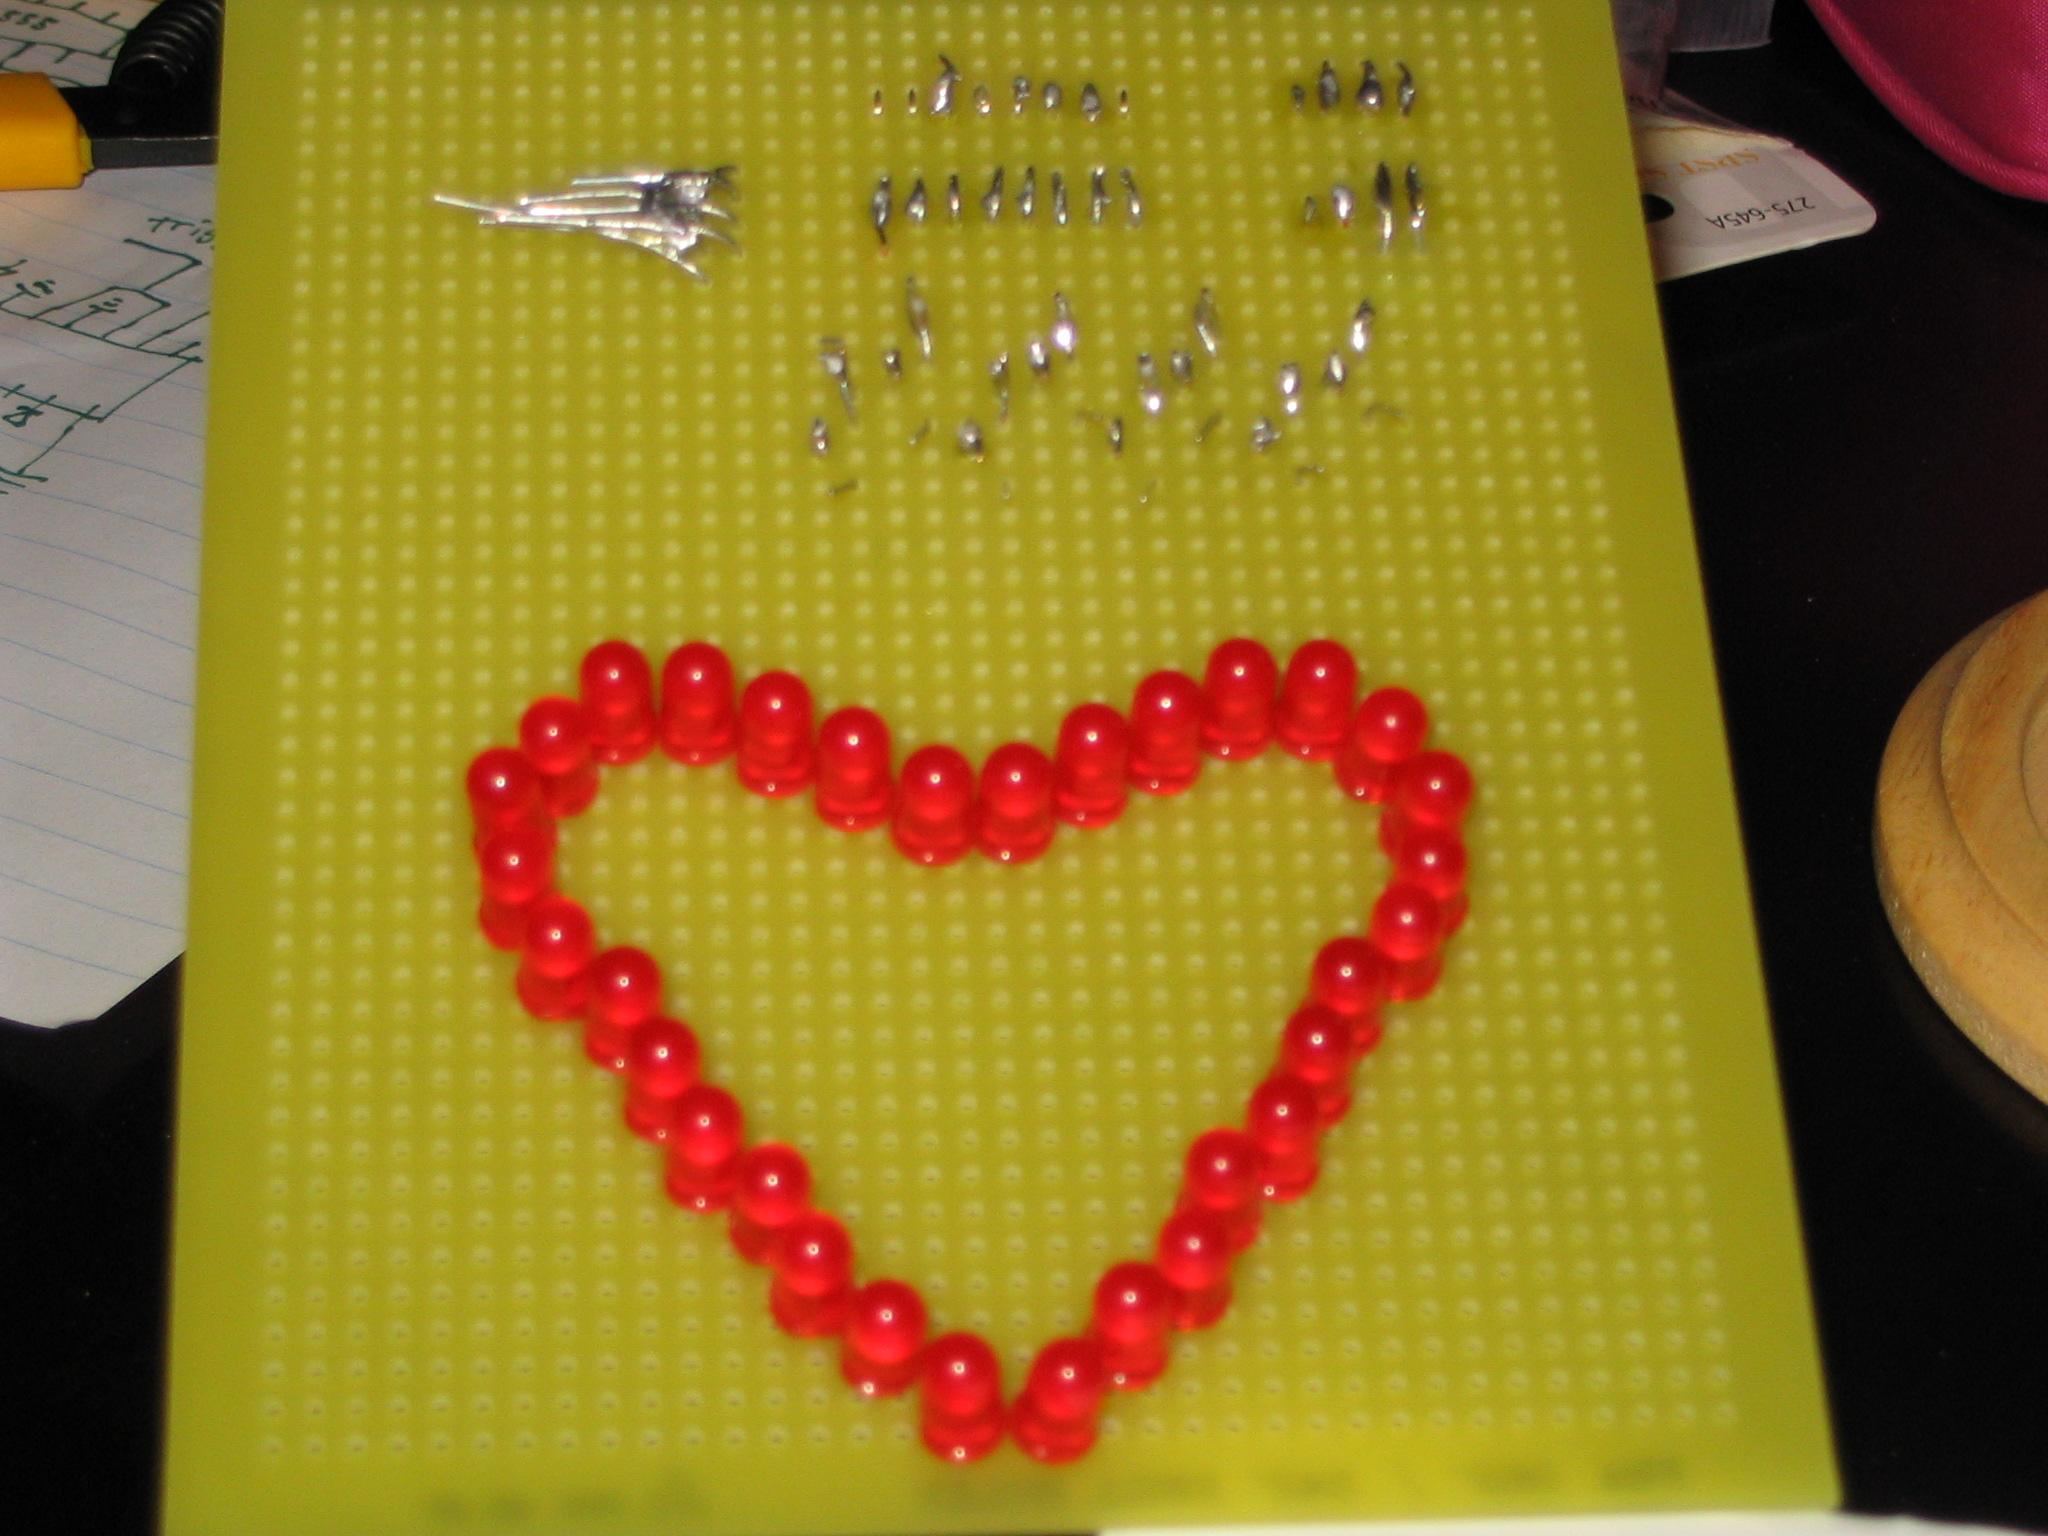 Build a binary LED heart decoration (Blinkenheart)